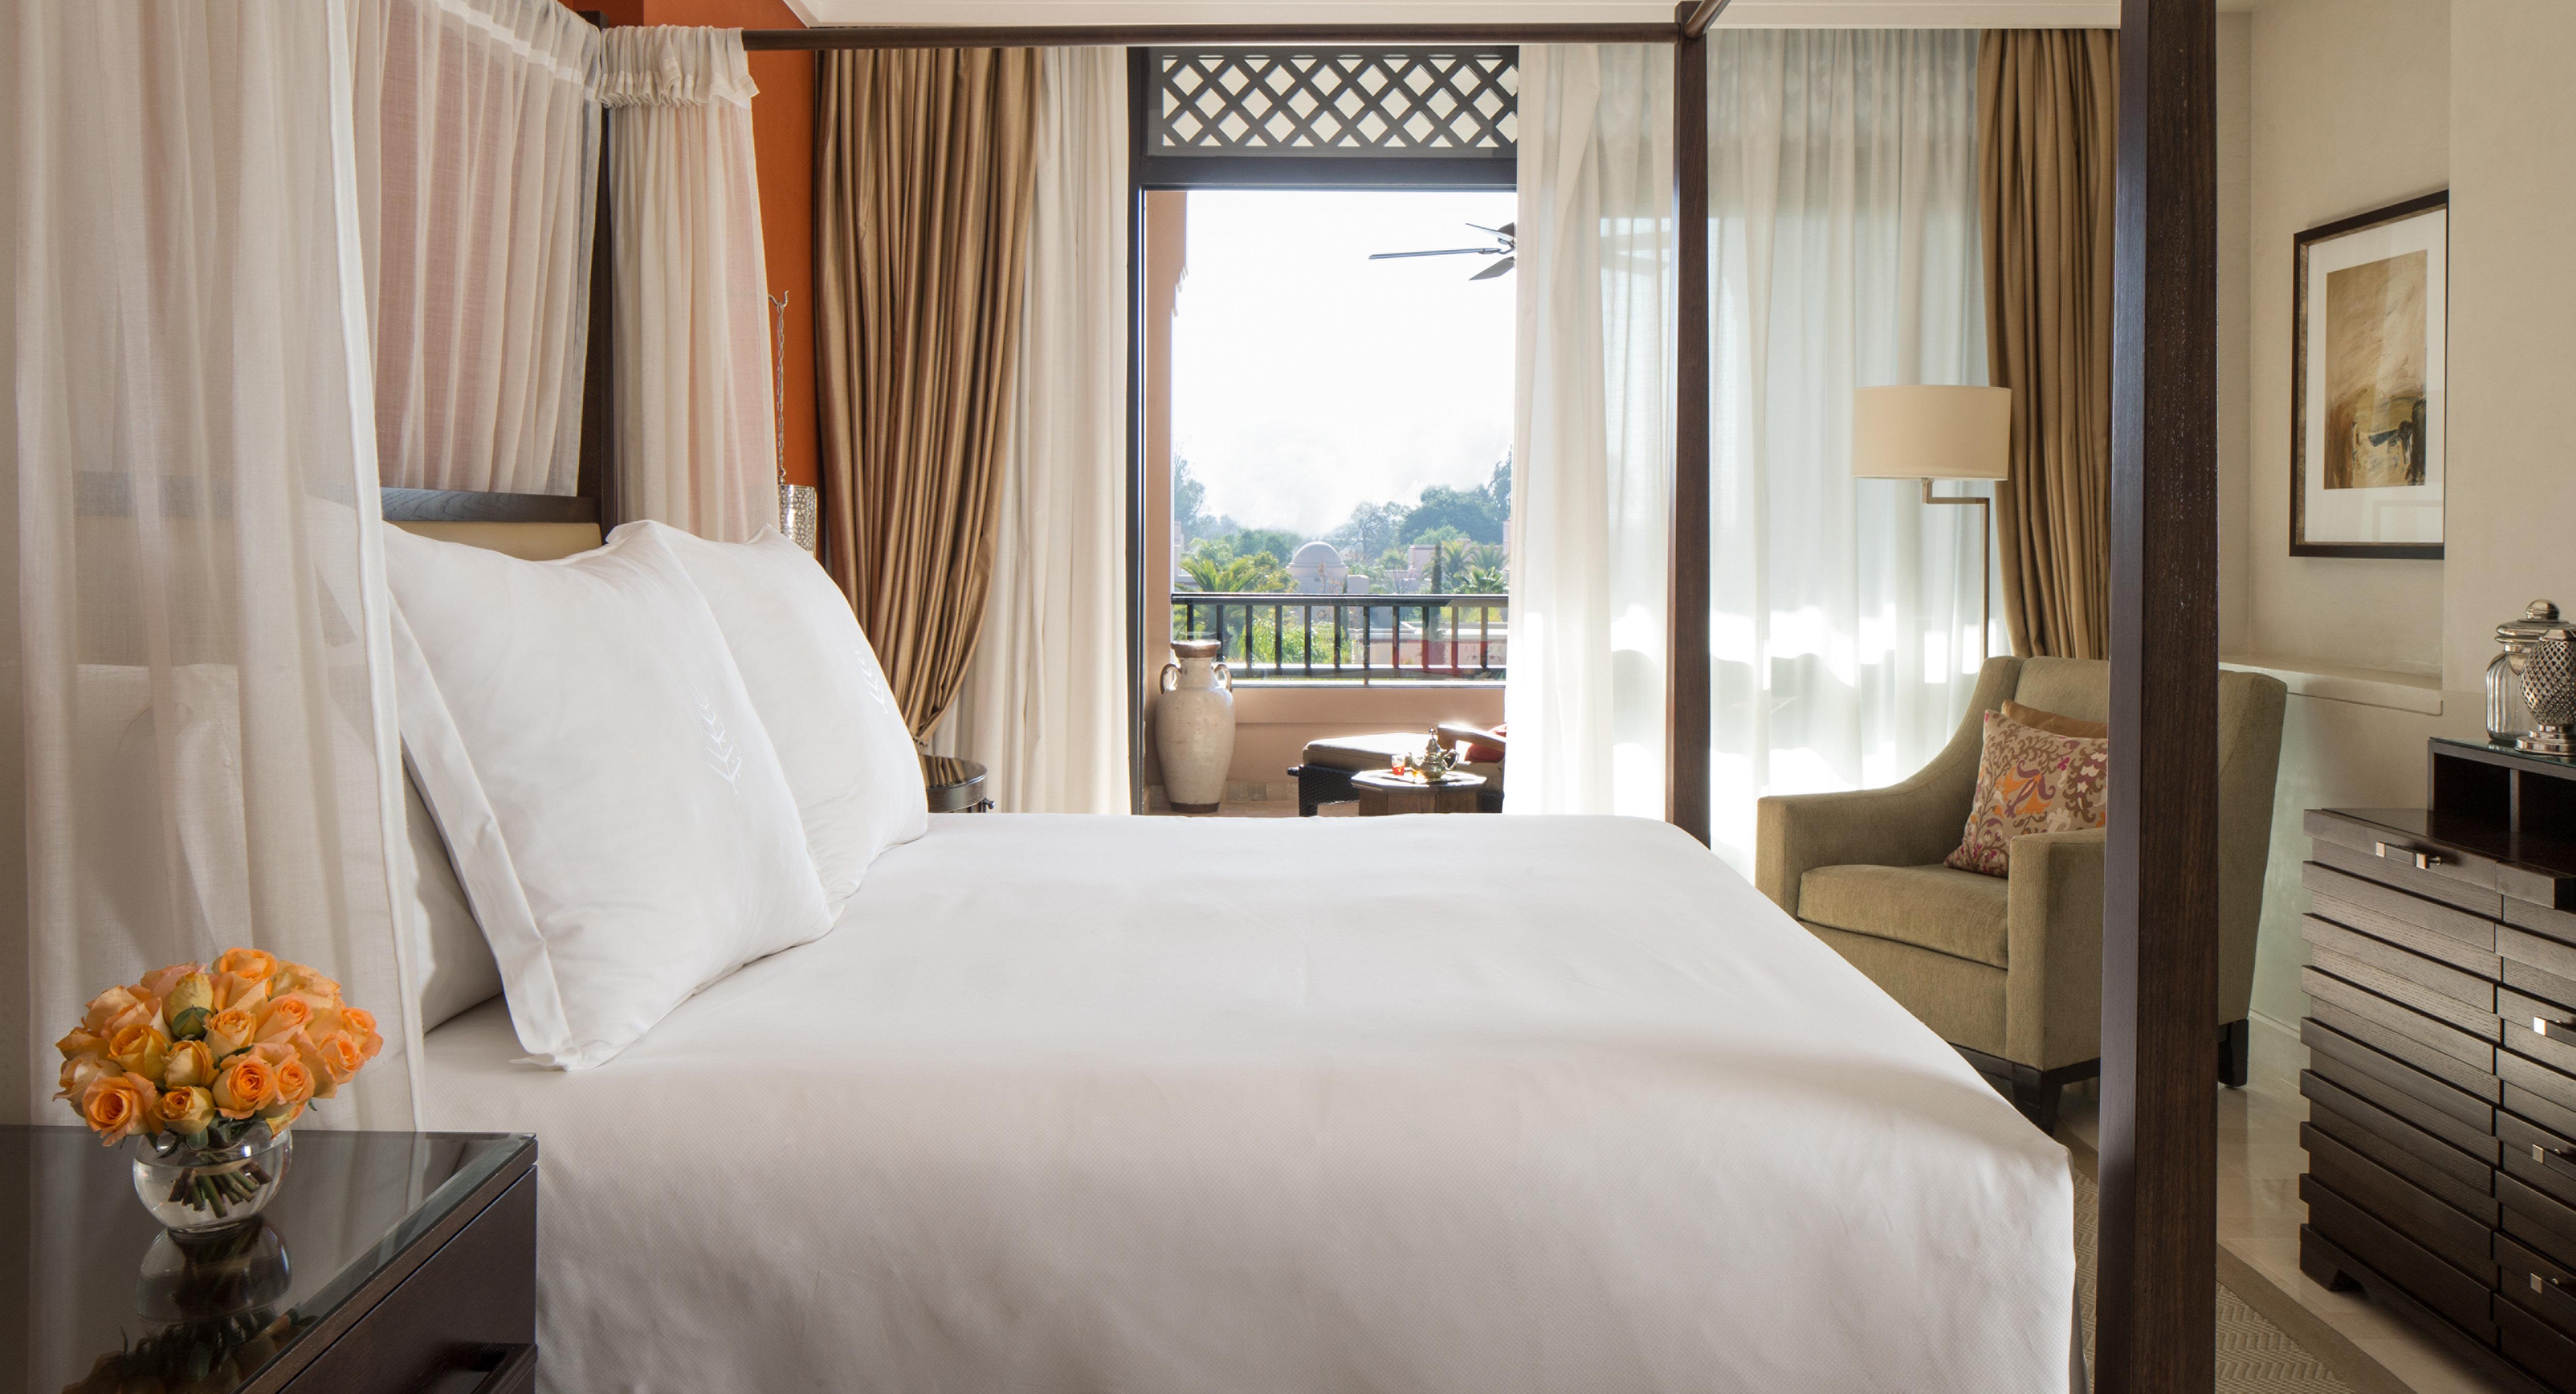 luxury-hotel-suite-marakech